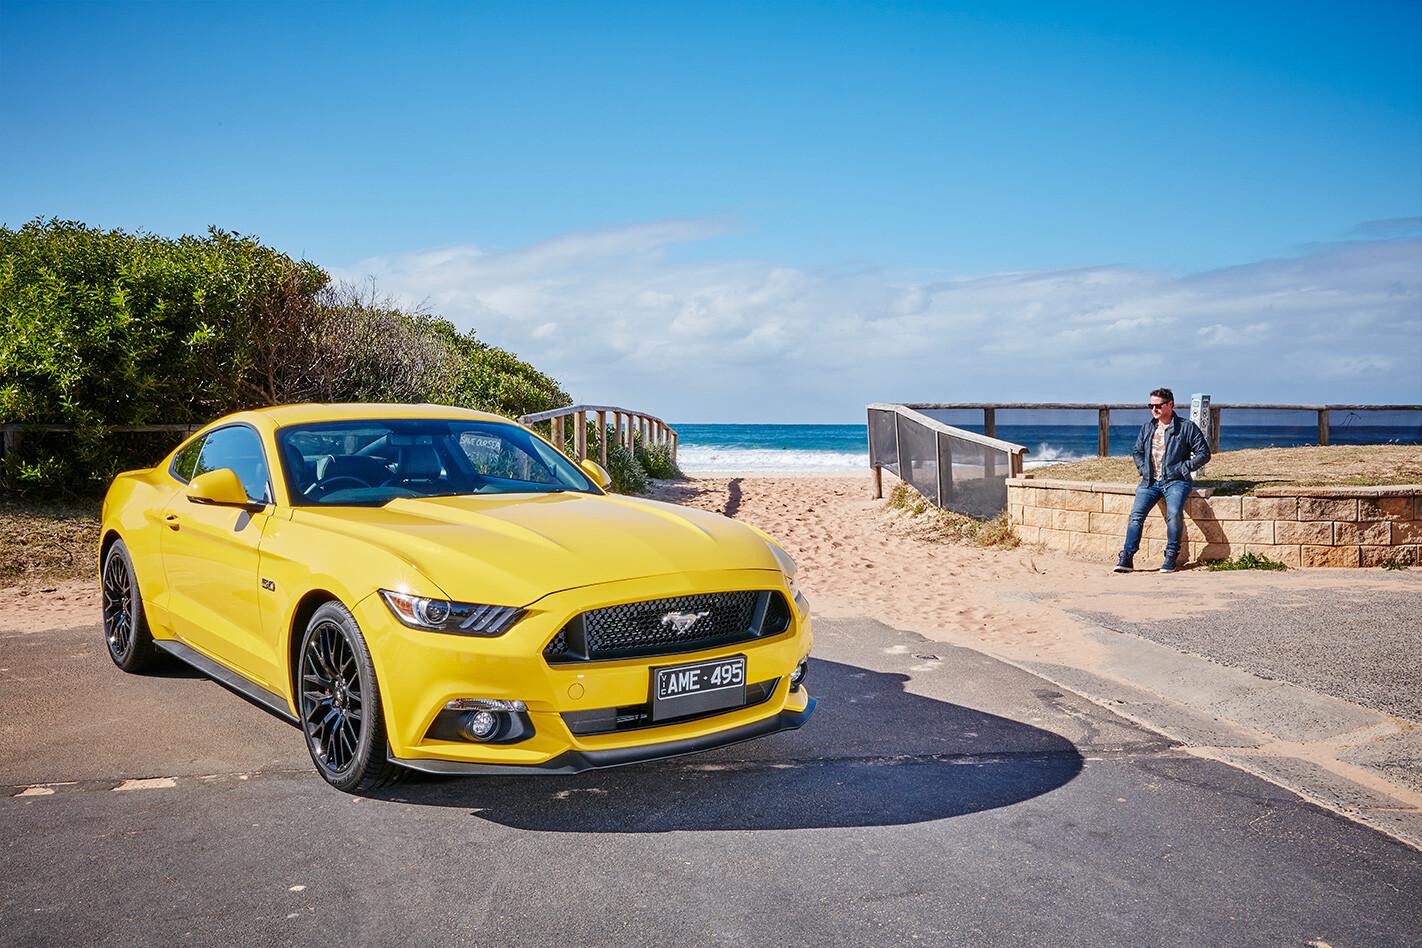 Ford Mustang Loan Front Quarter Jpg